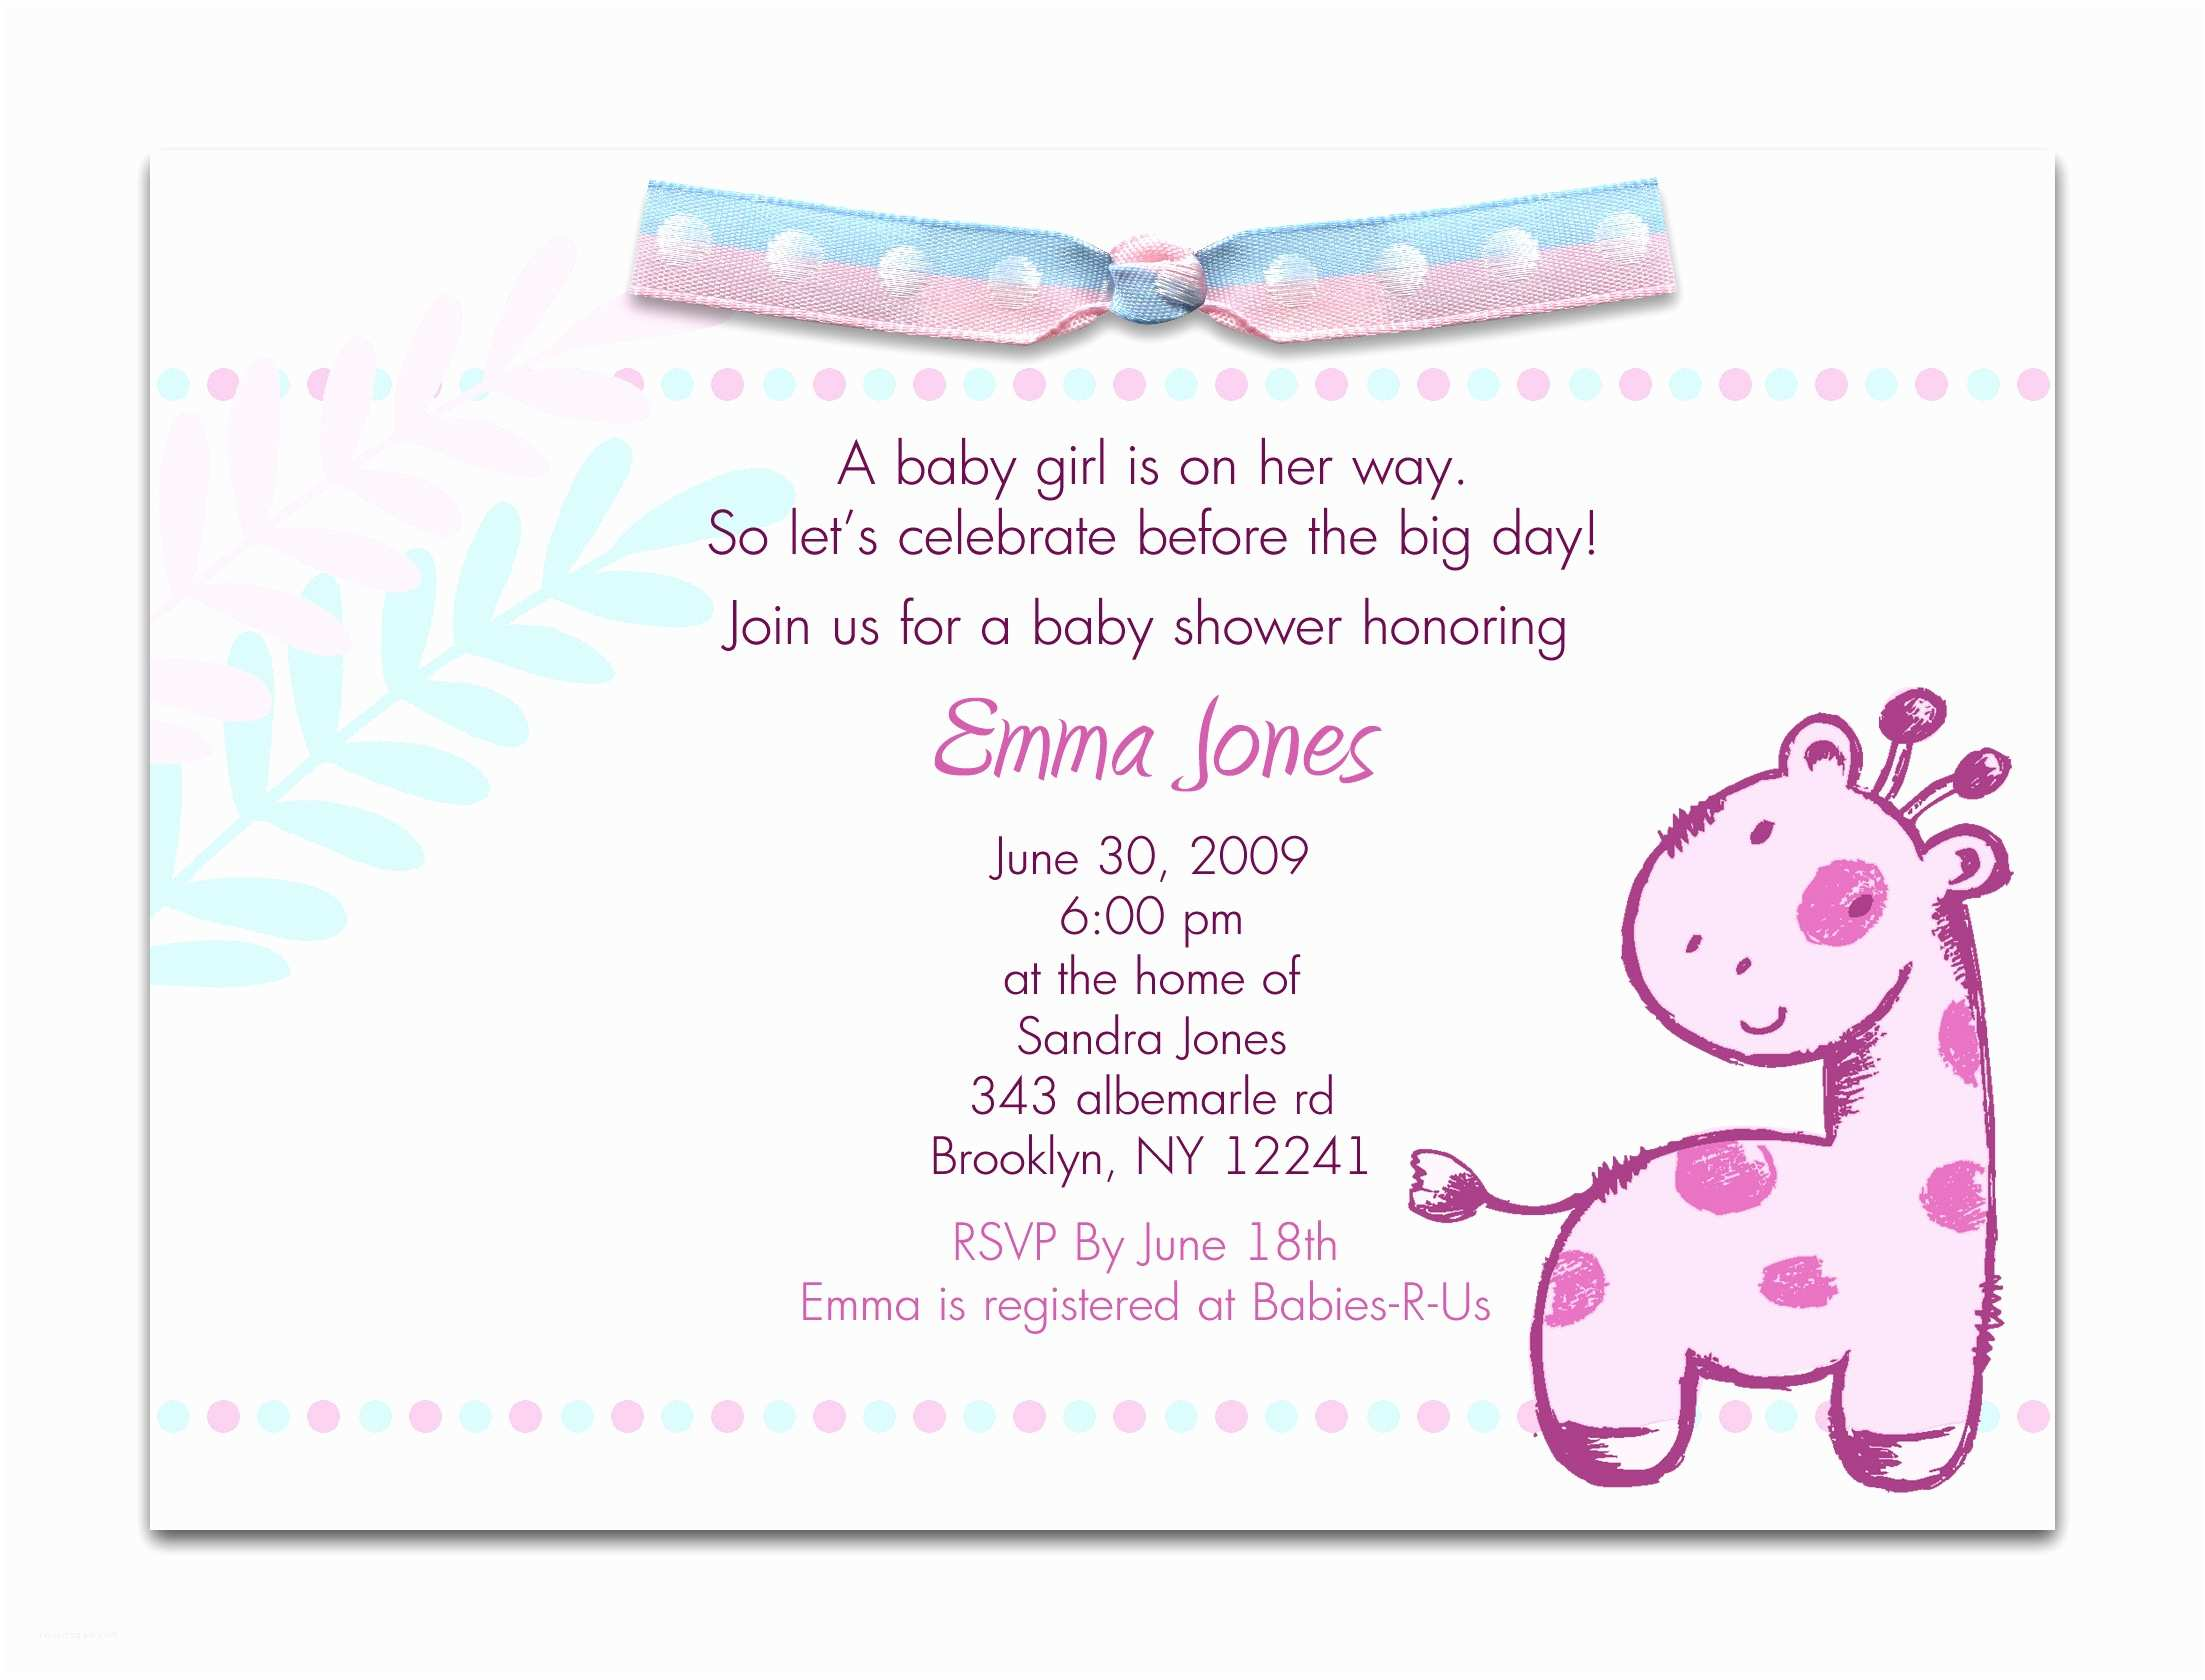 Make Baby Shower Invitations Online Cute Wording for Baby Shower Invitations